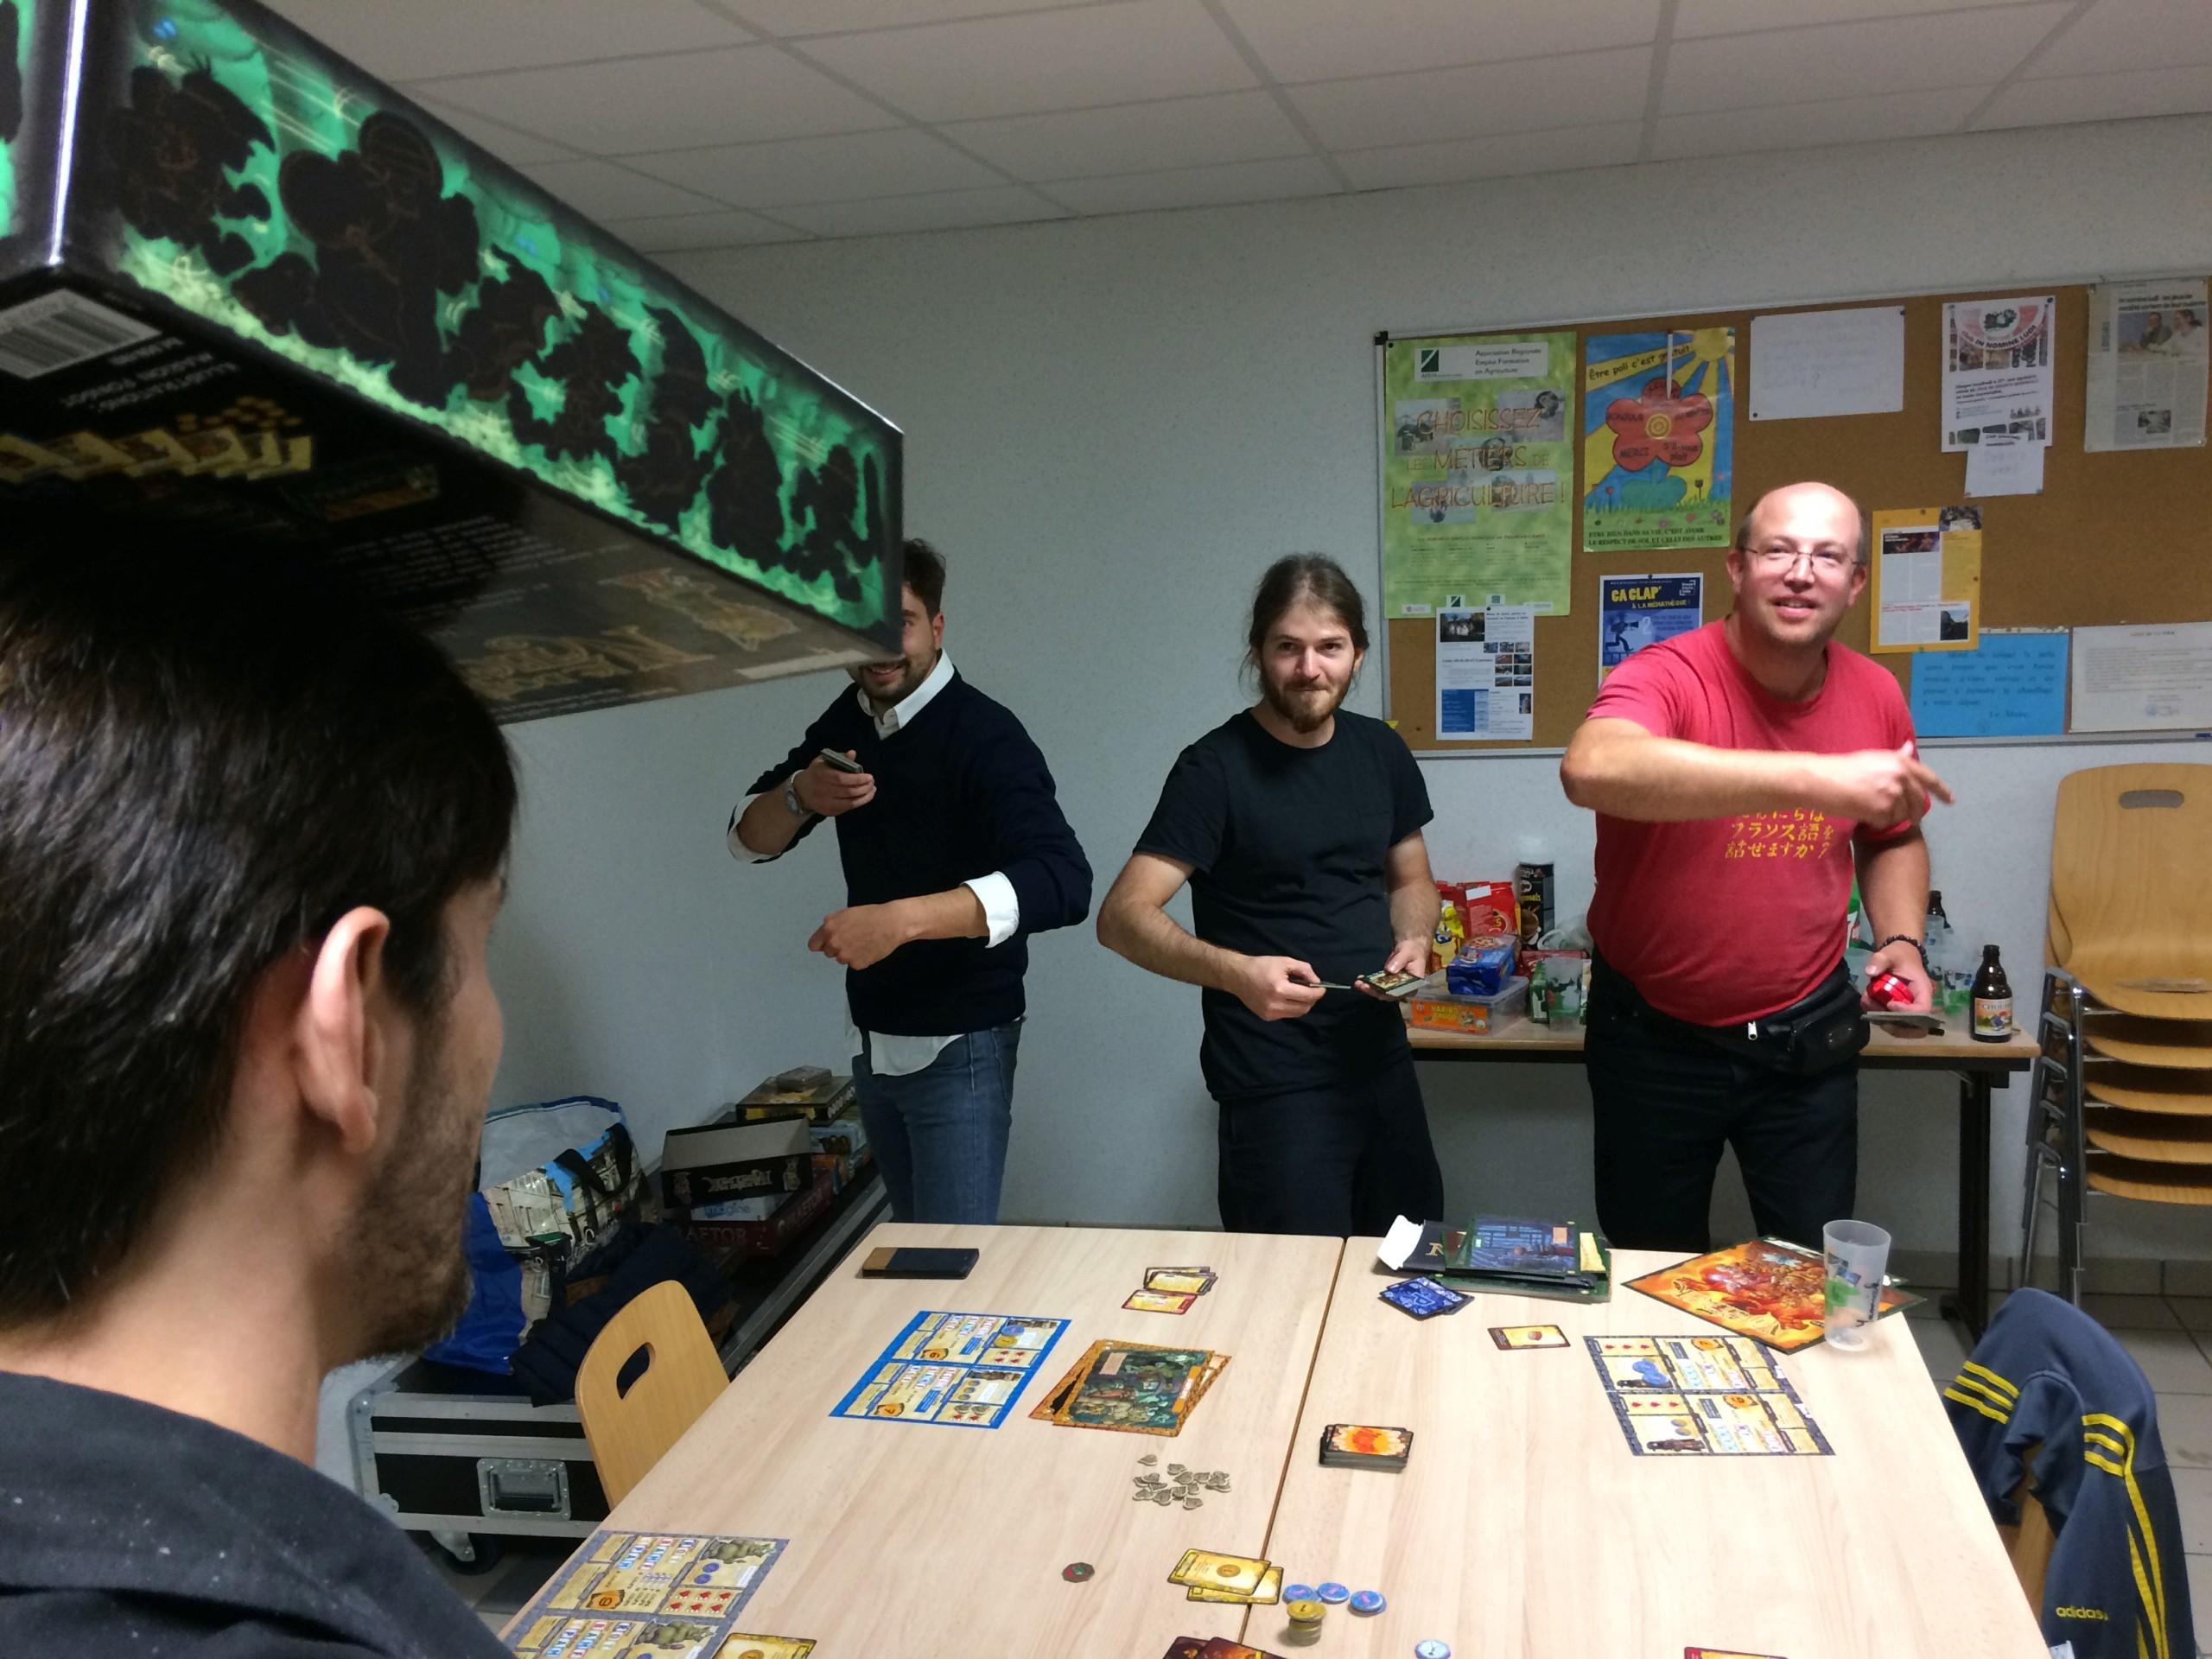 [2018] Vendredi 31 août : soirée jeux du mois - 18/19j Img_0912